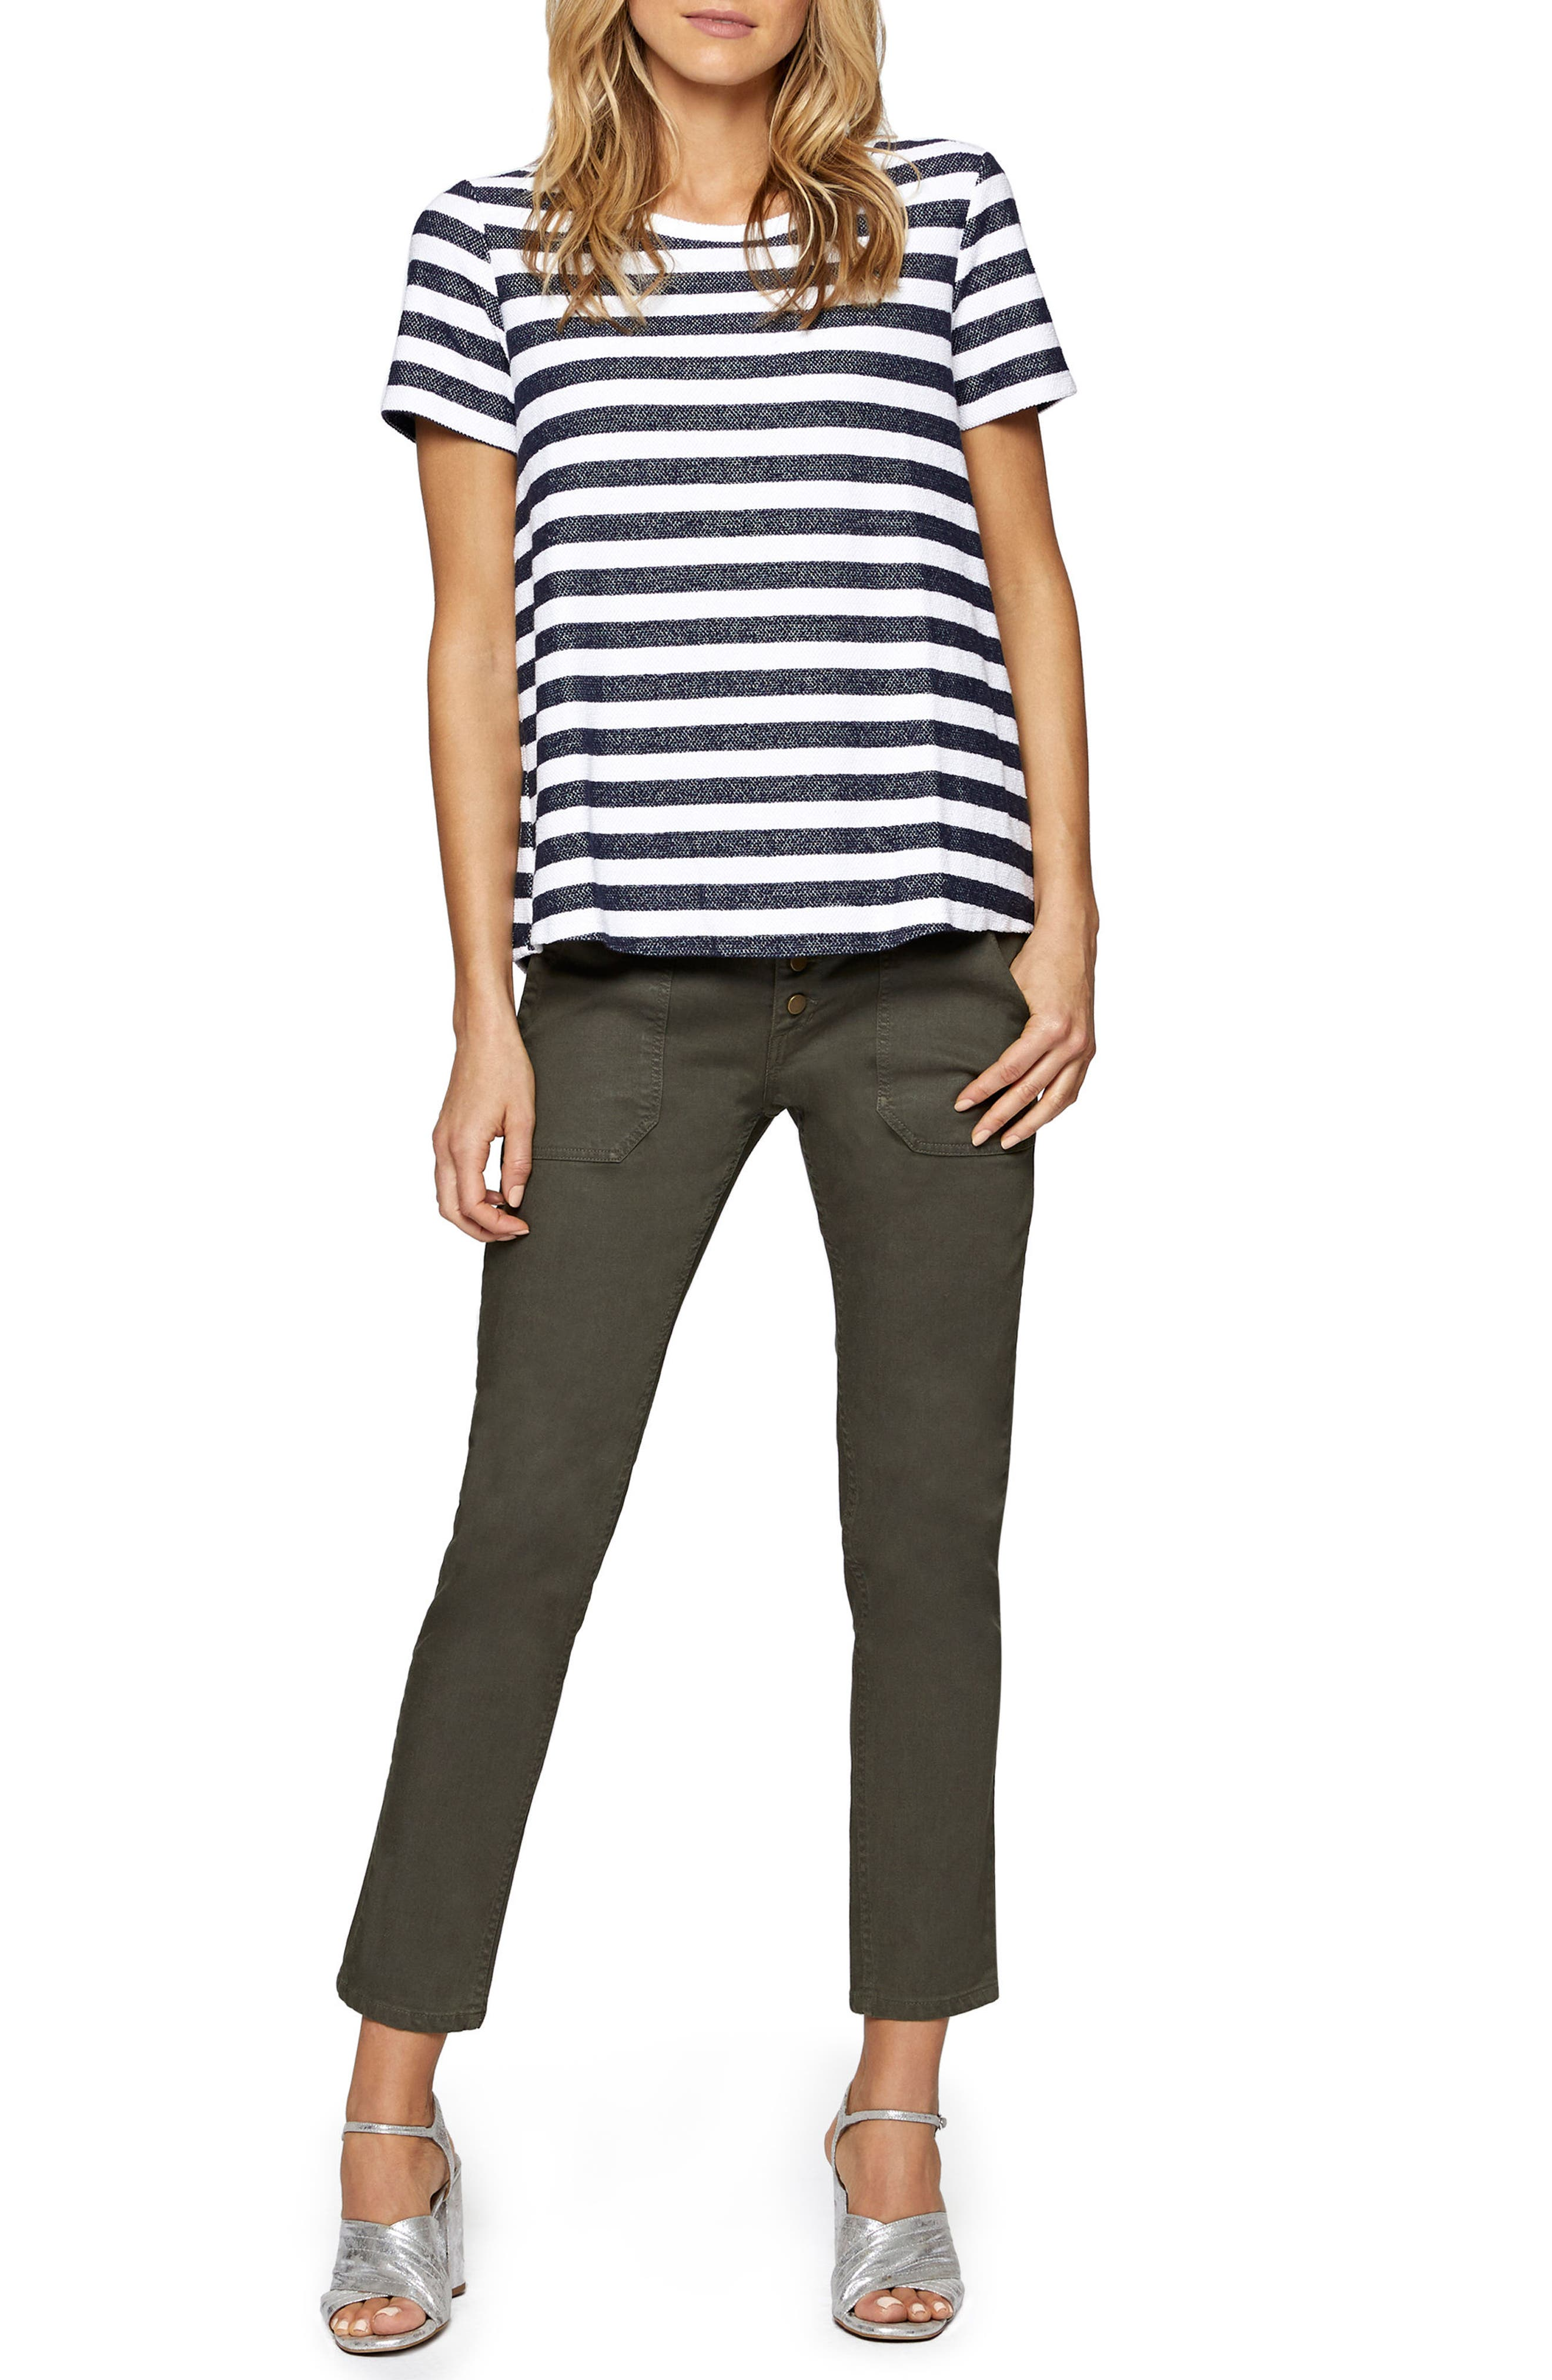 Francesca Back Inset Stripe Tee,                             Alternate thumbnail 3, color,                             Heritage Navy/ Milk